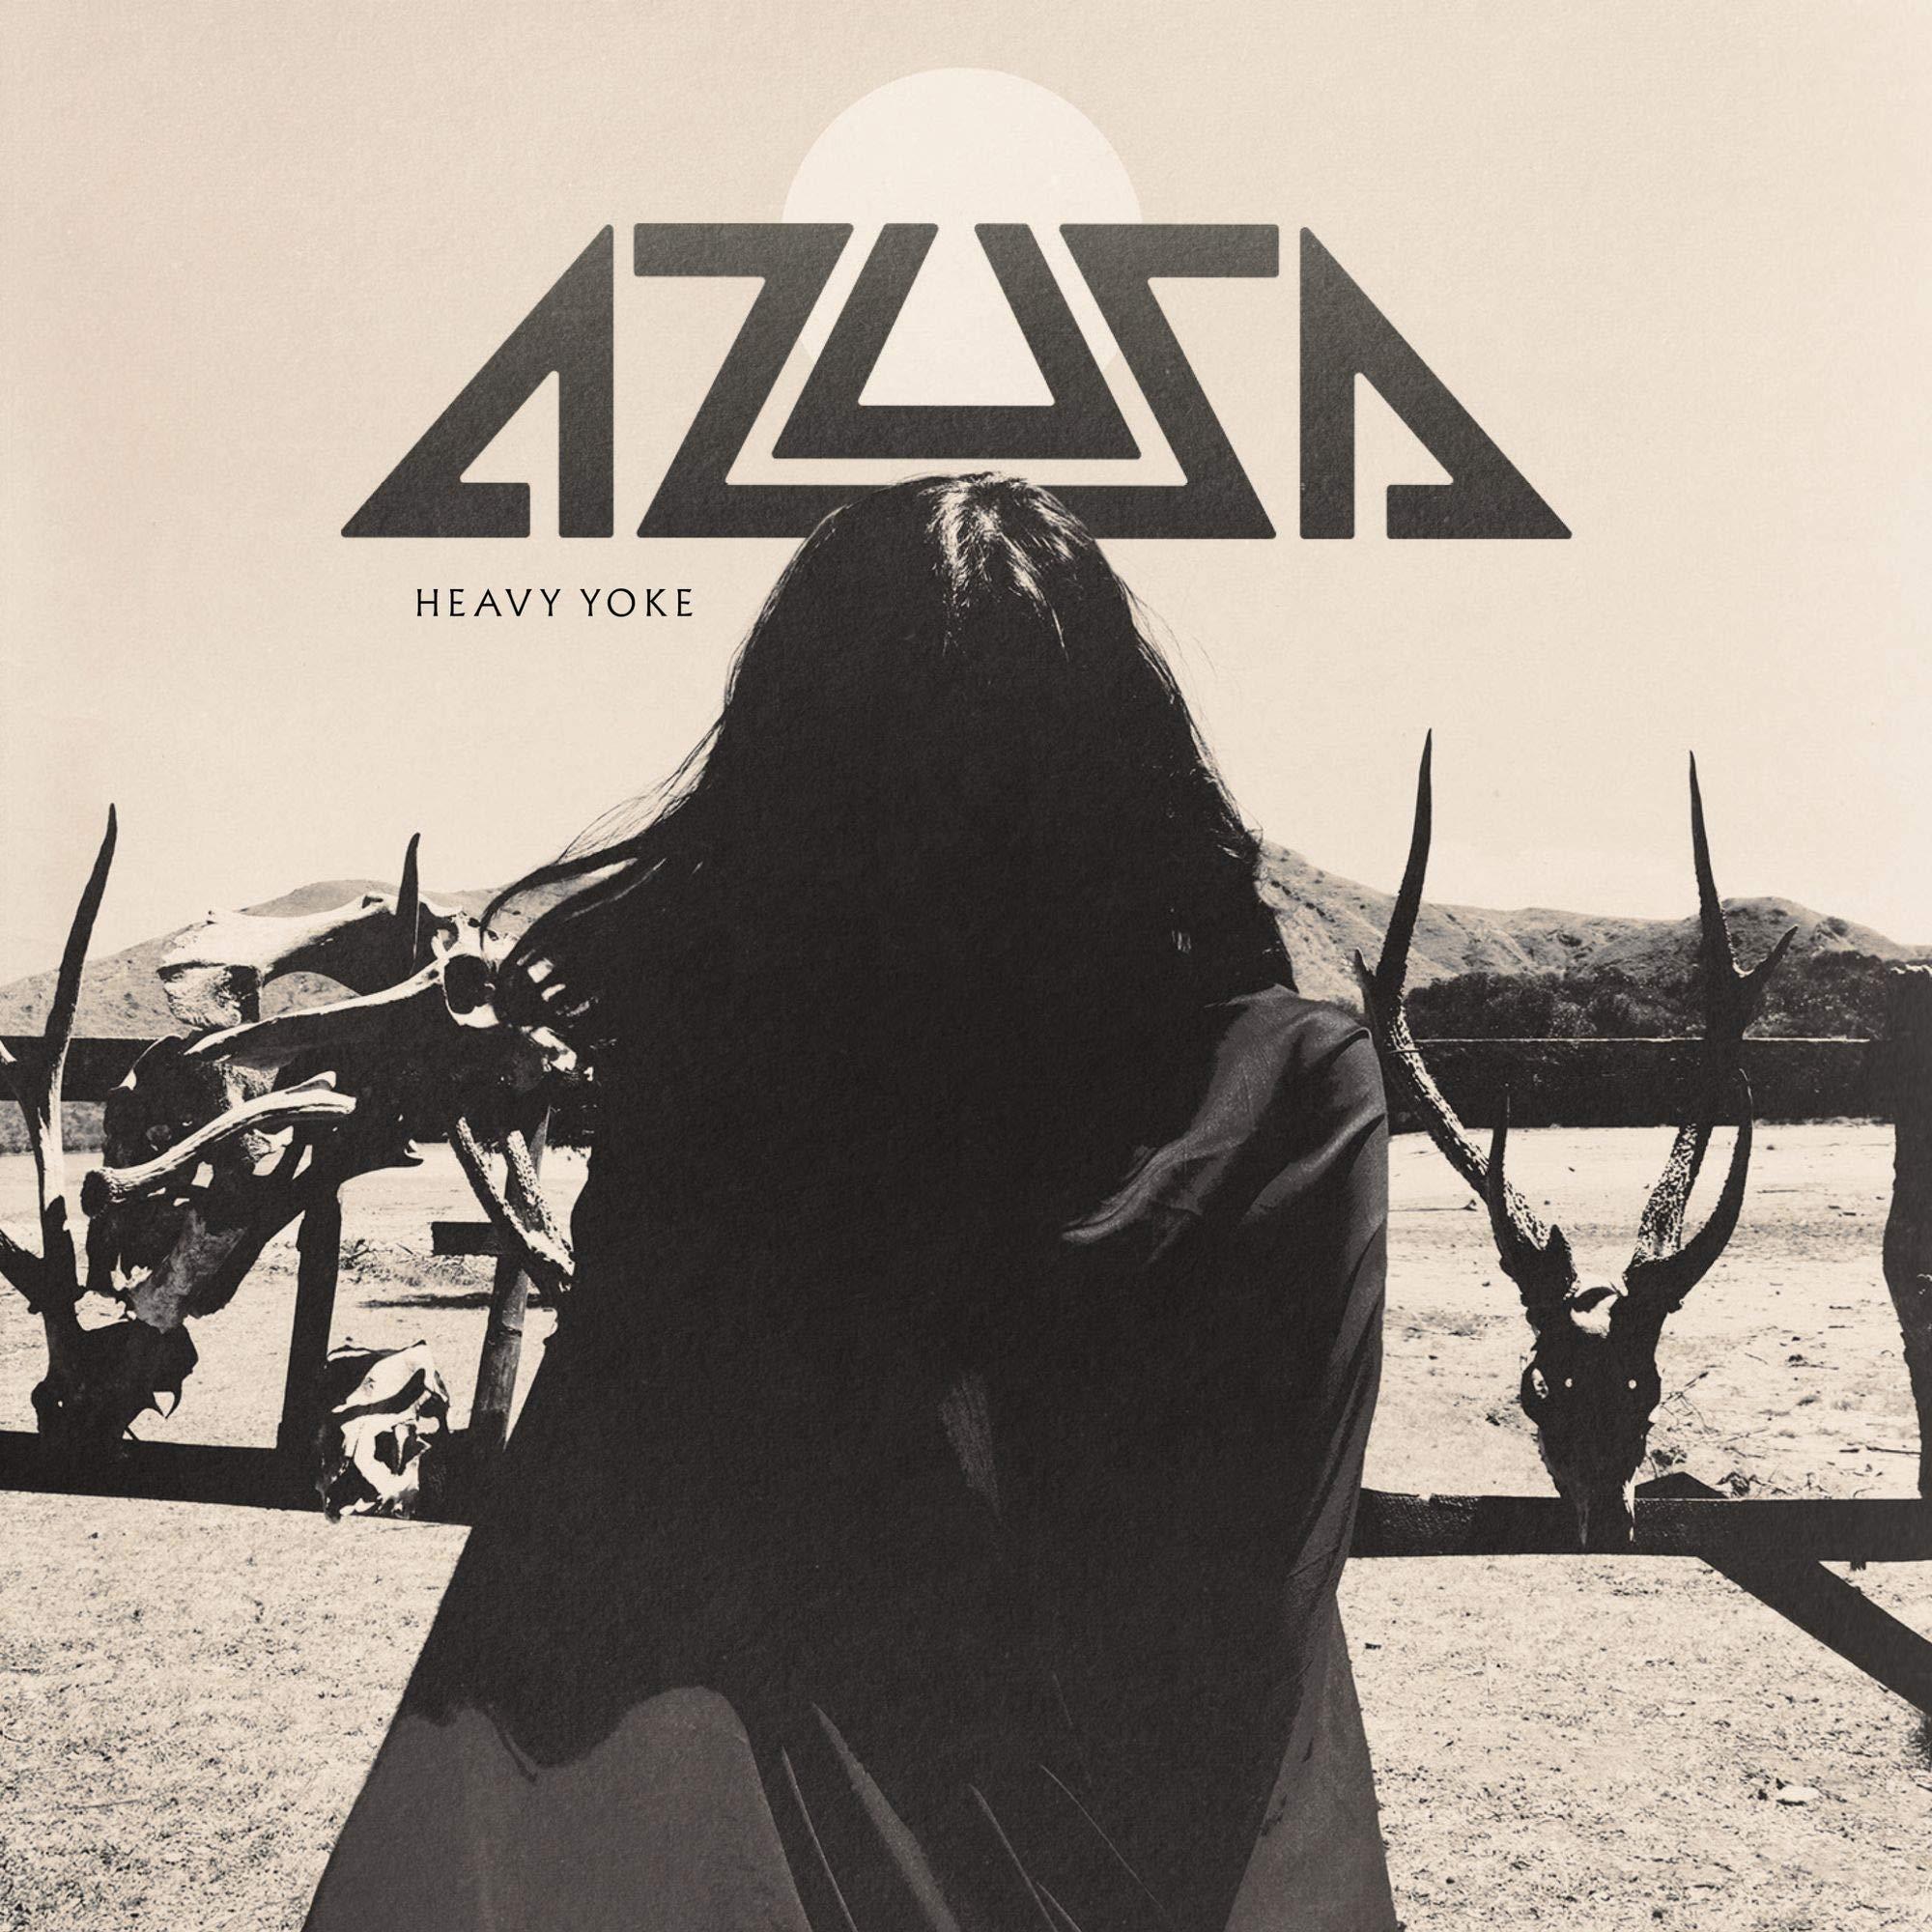 CD : Azusa - Heavy Yoke (CD)